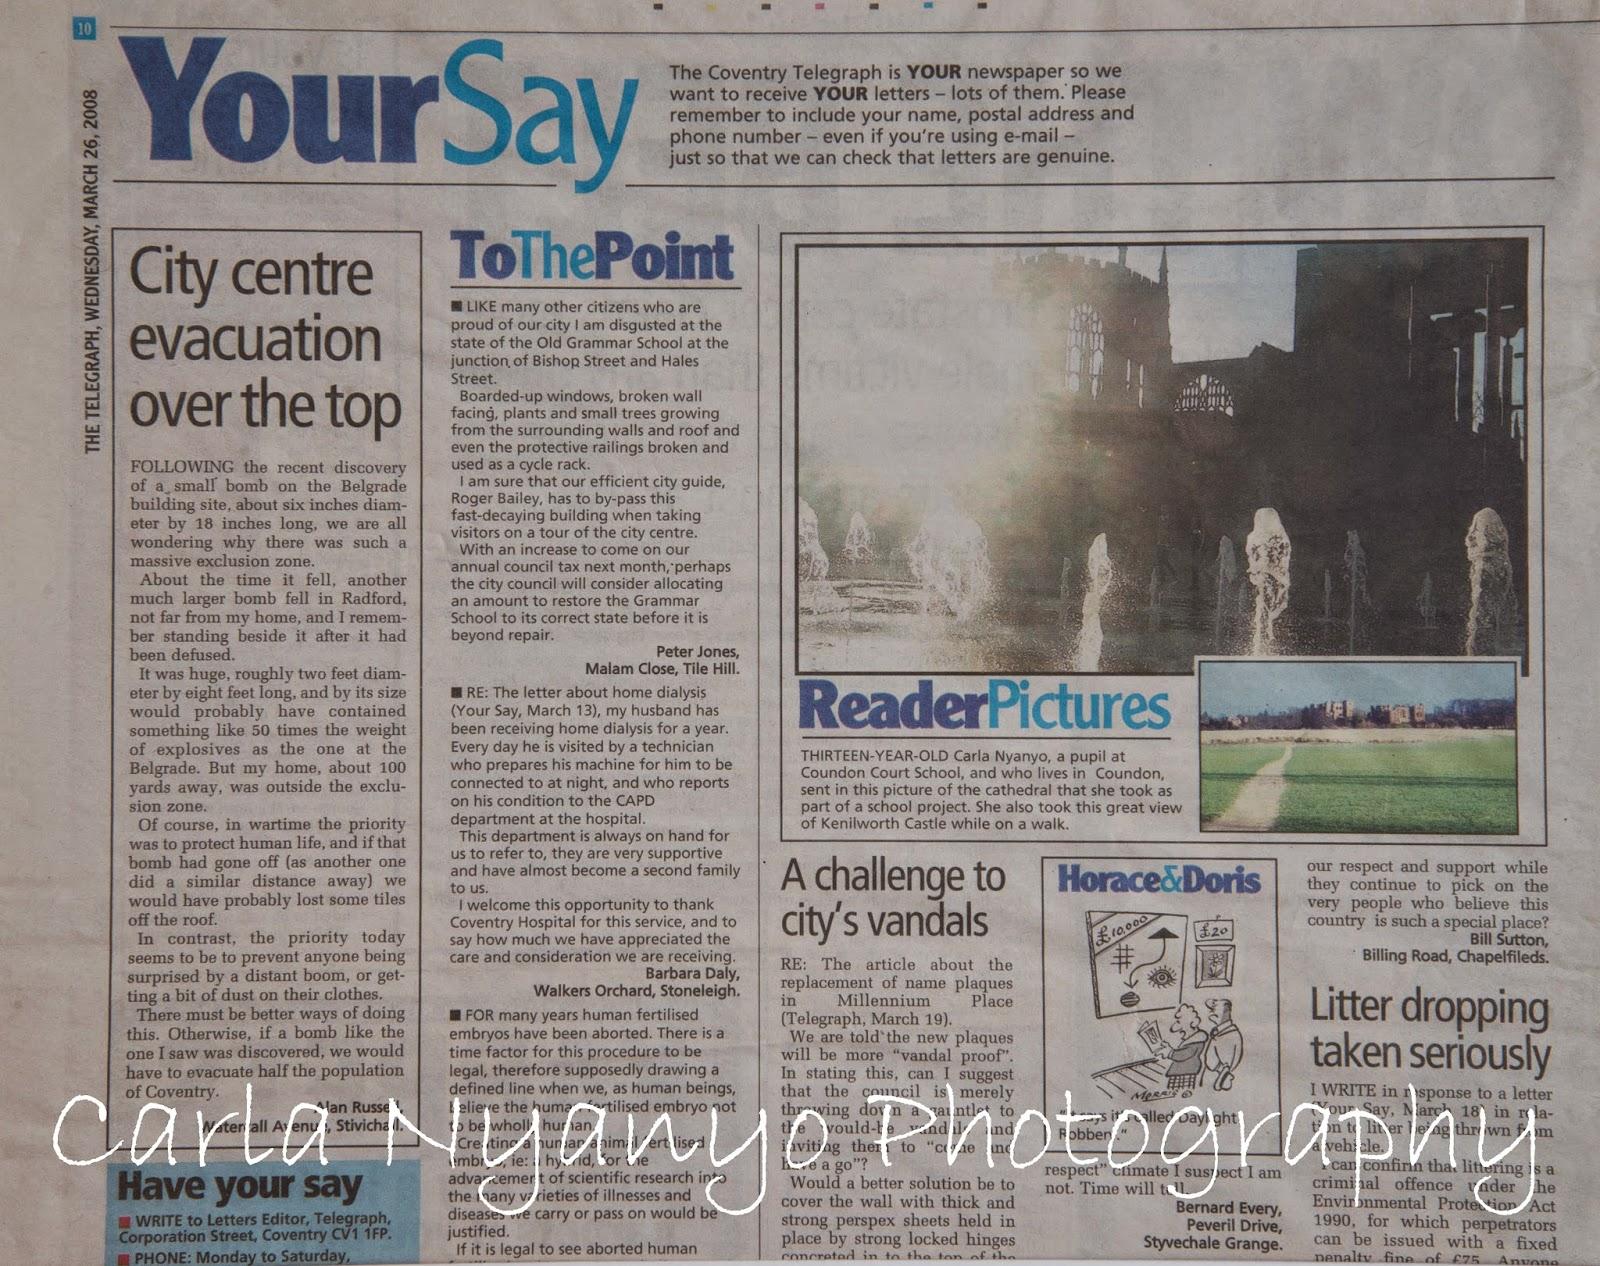 photo's in newspaper